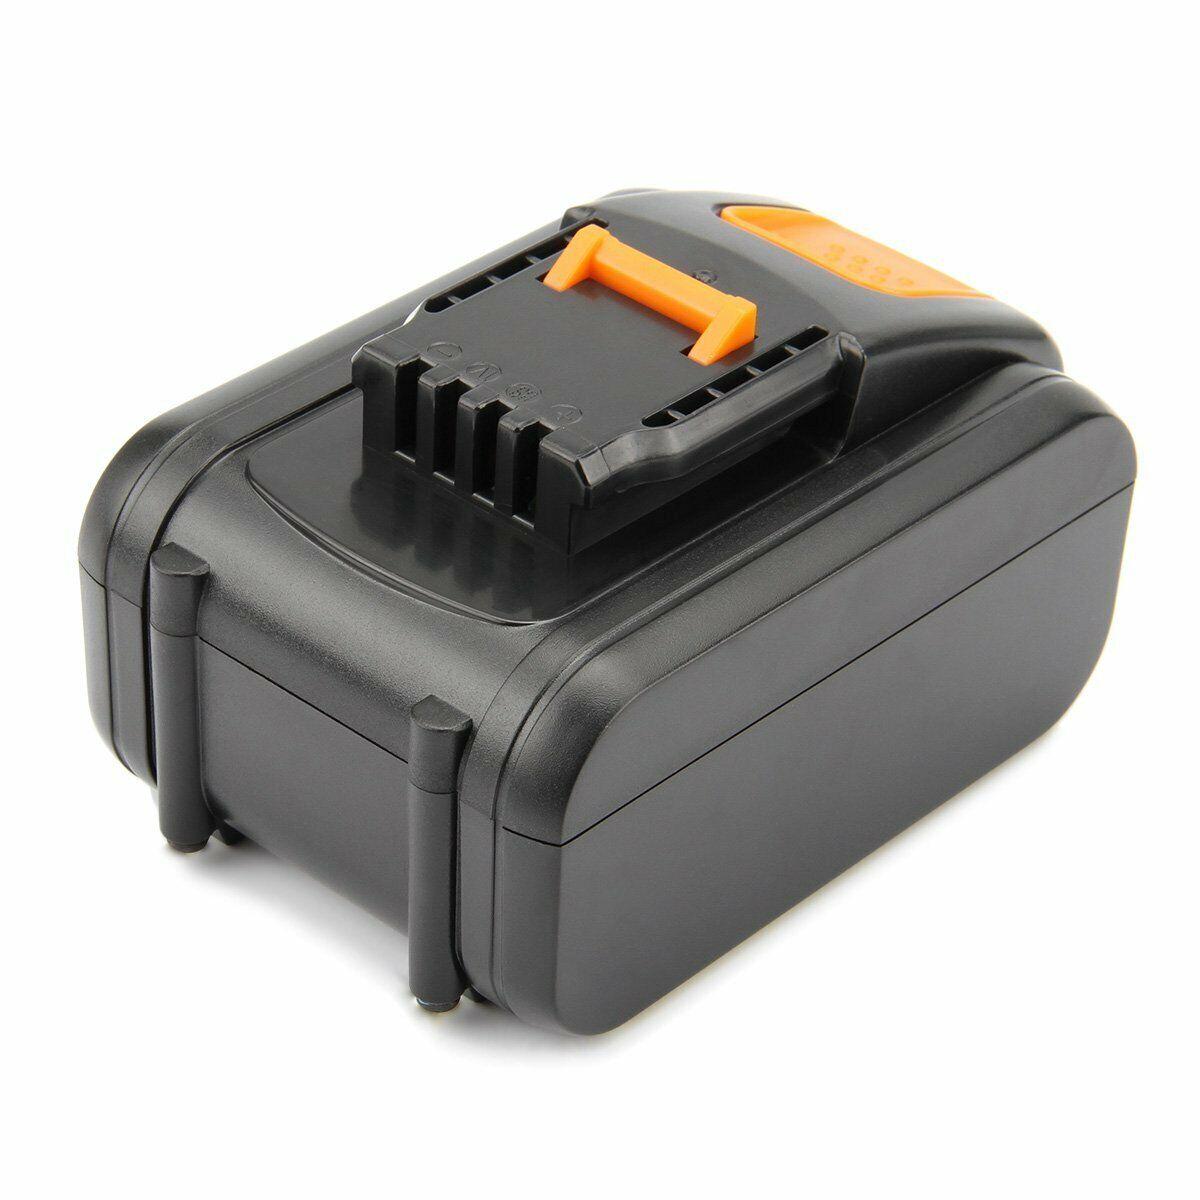 Creabest 3000mAh 20V Li-Ion Batterie Pour Worx WA3551.1 WX678 WG169 WX166 RK2859